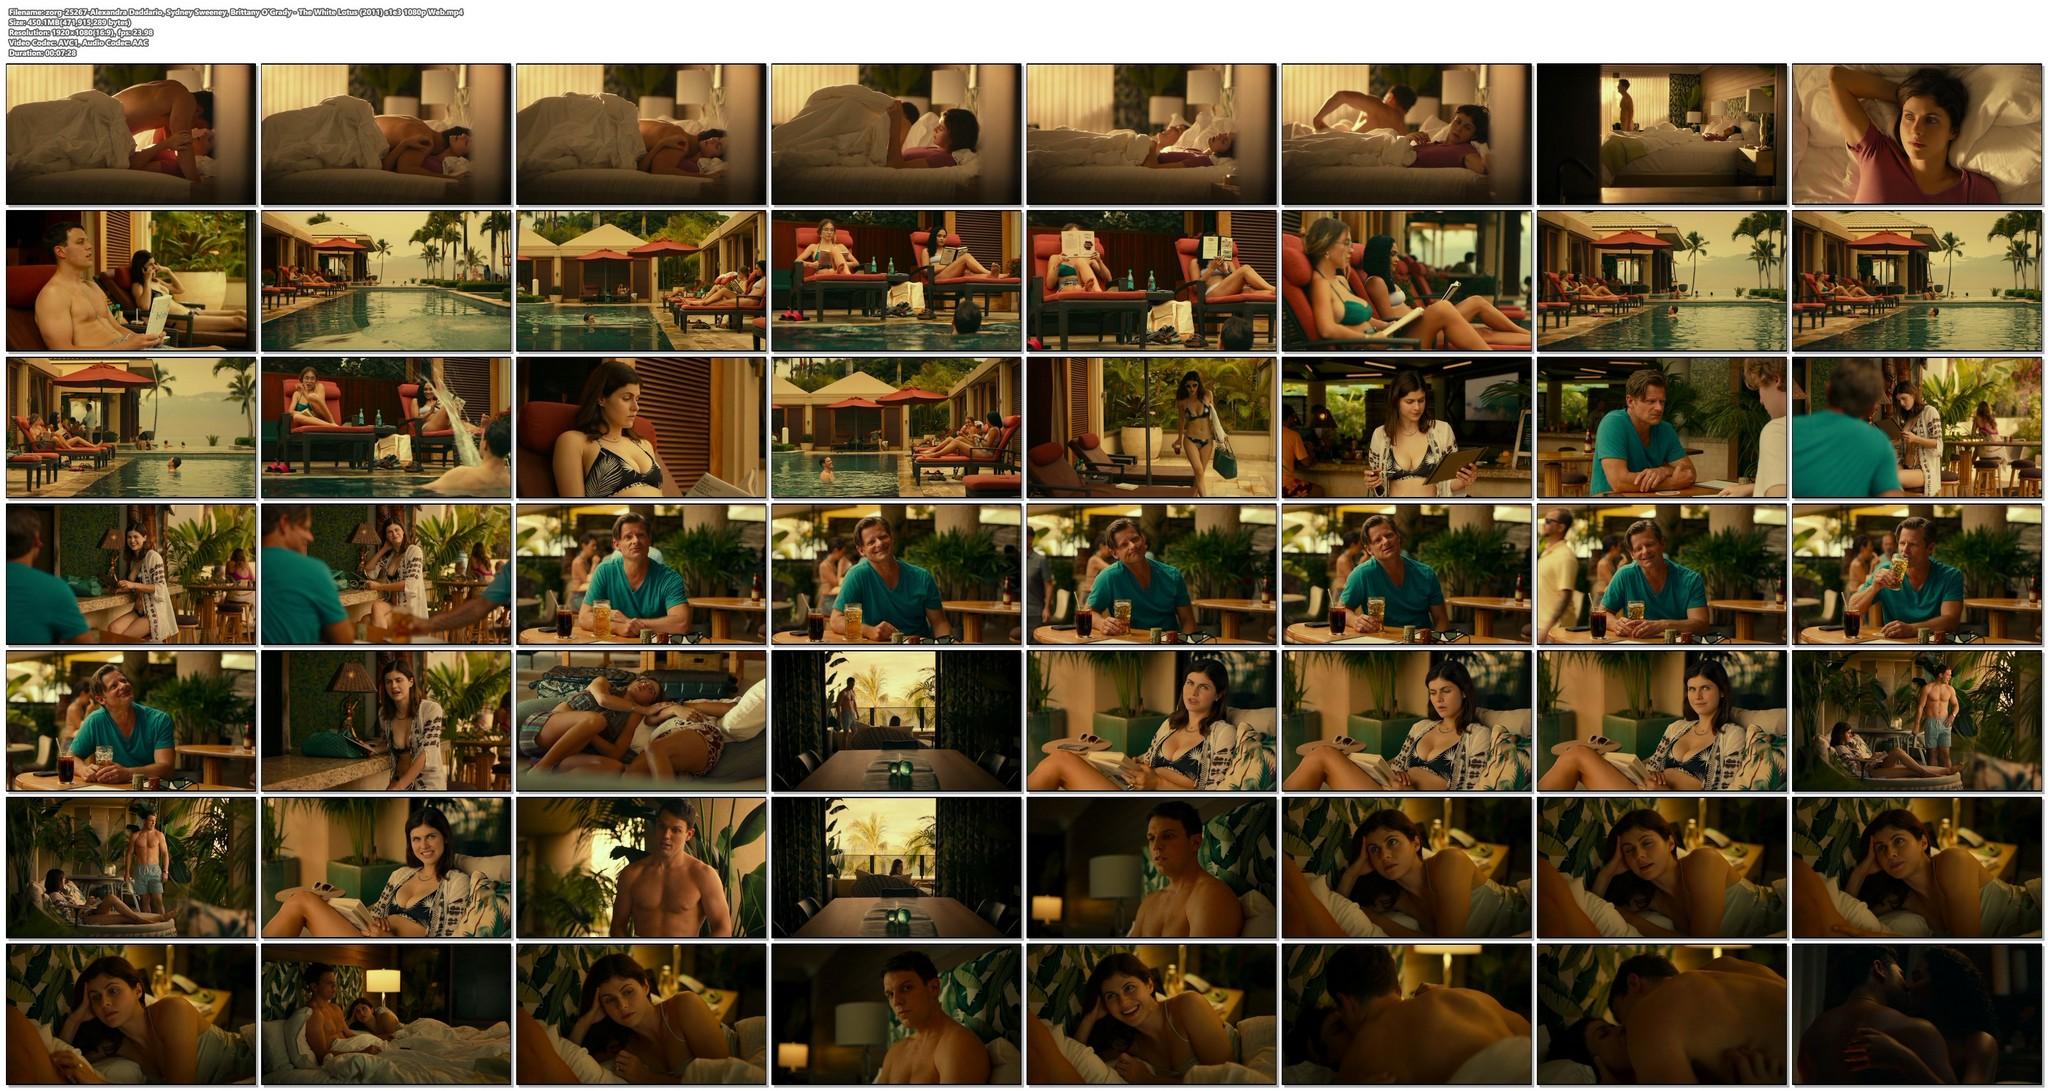 Alexandra Daddario sexy Sydney Sweeney Brittany OGrady hot The White Lotus 2011 s1e3 1080p Web 19